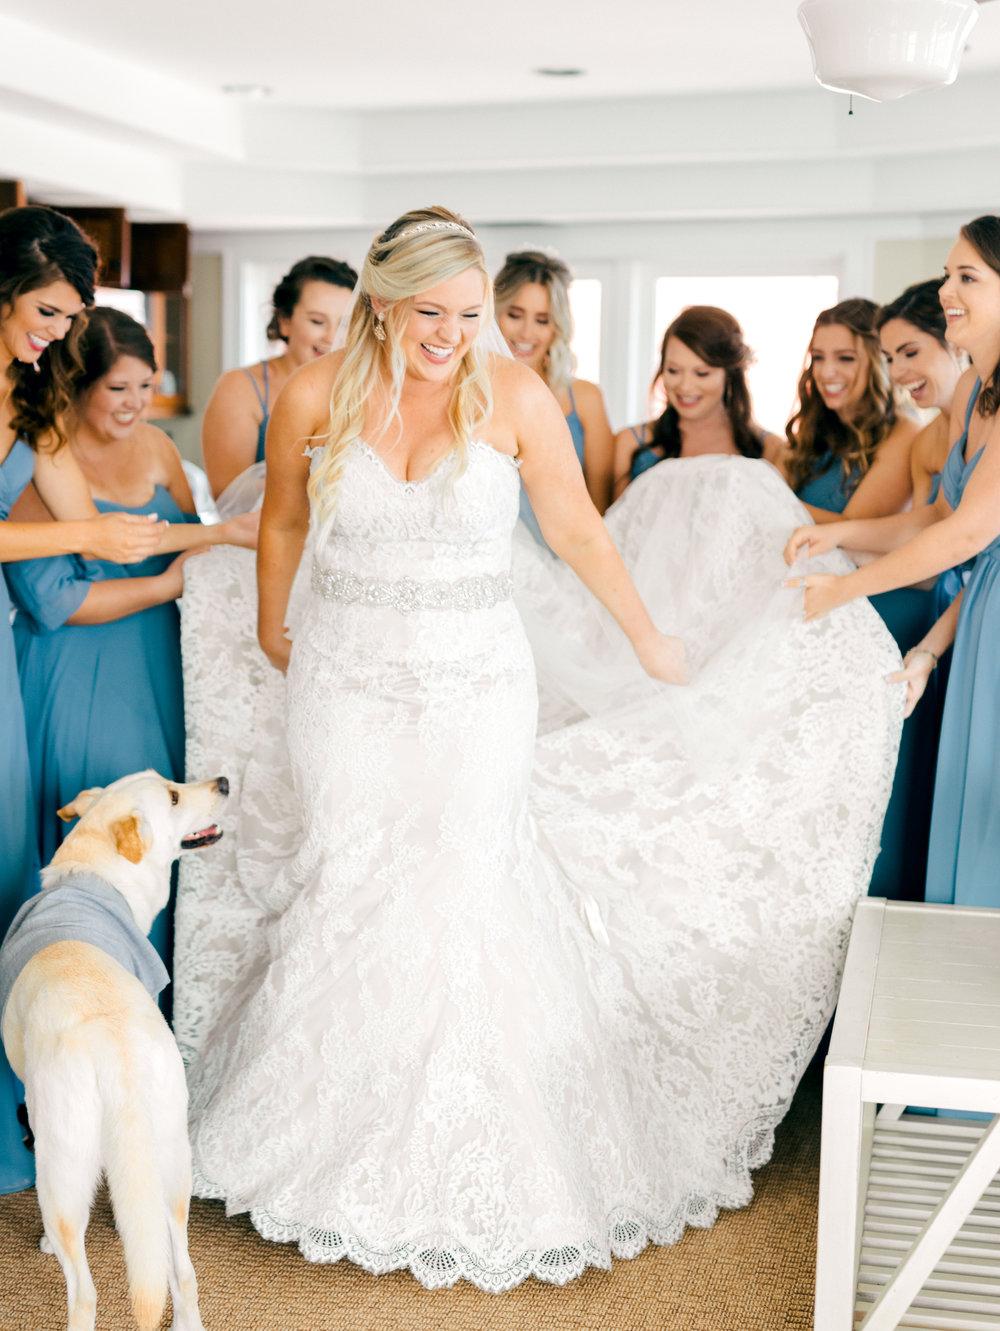 4saint_simons_island_wedding_megan_the_photographerIMG_9647A.jpg